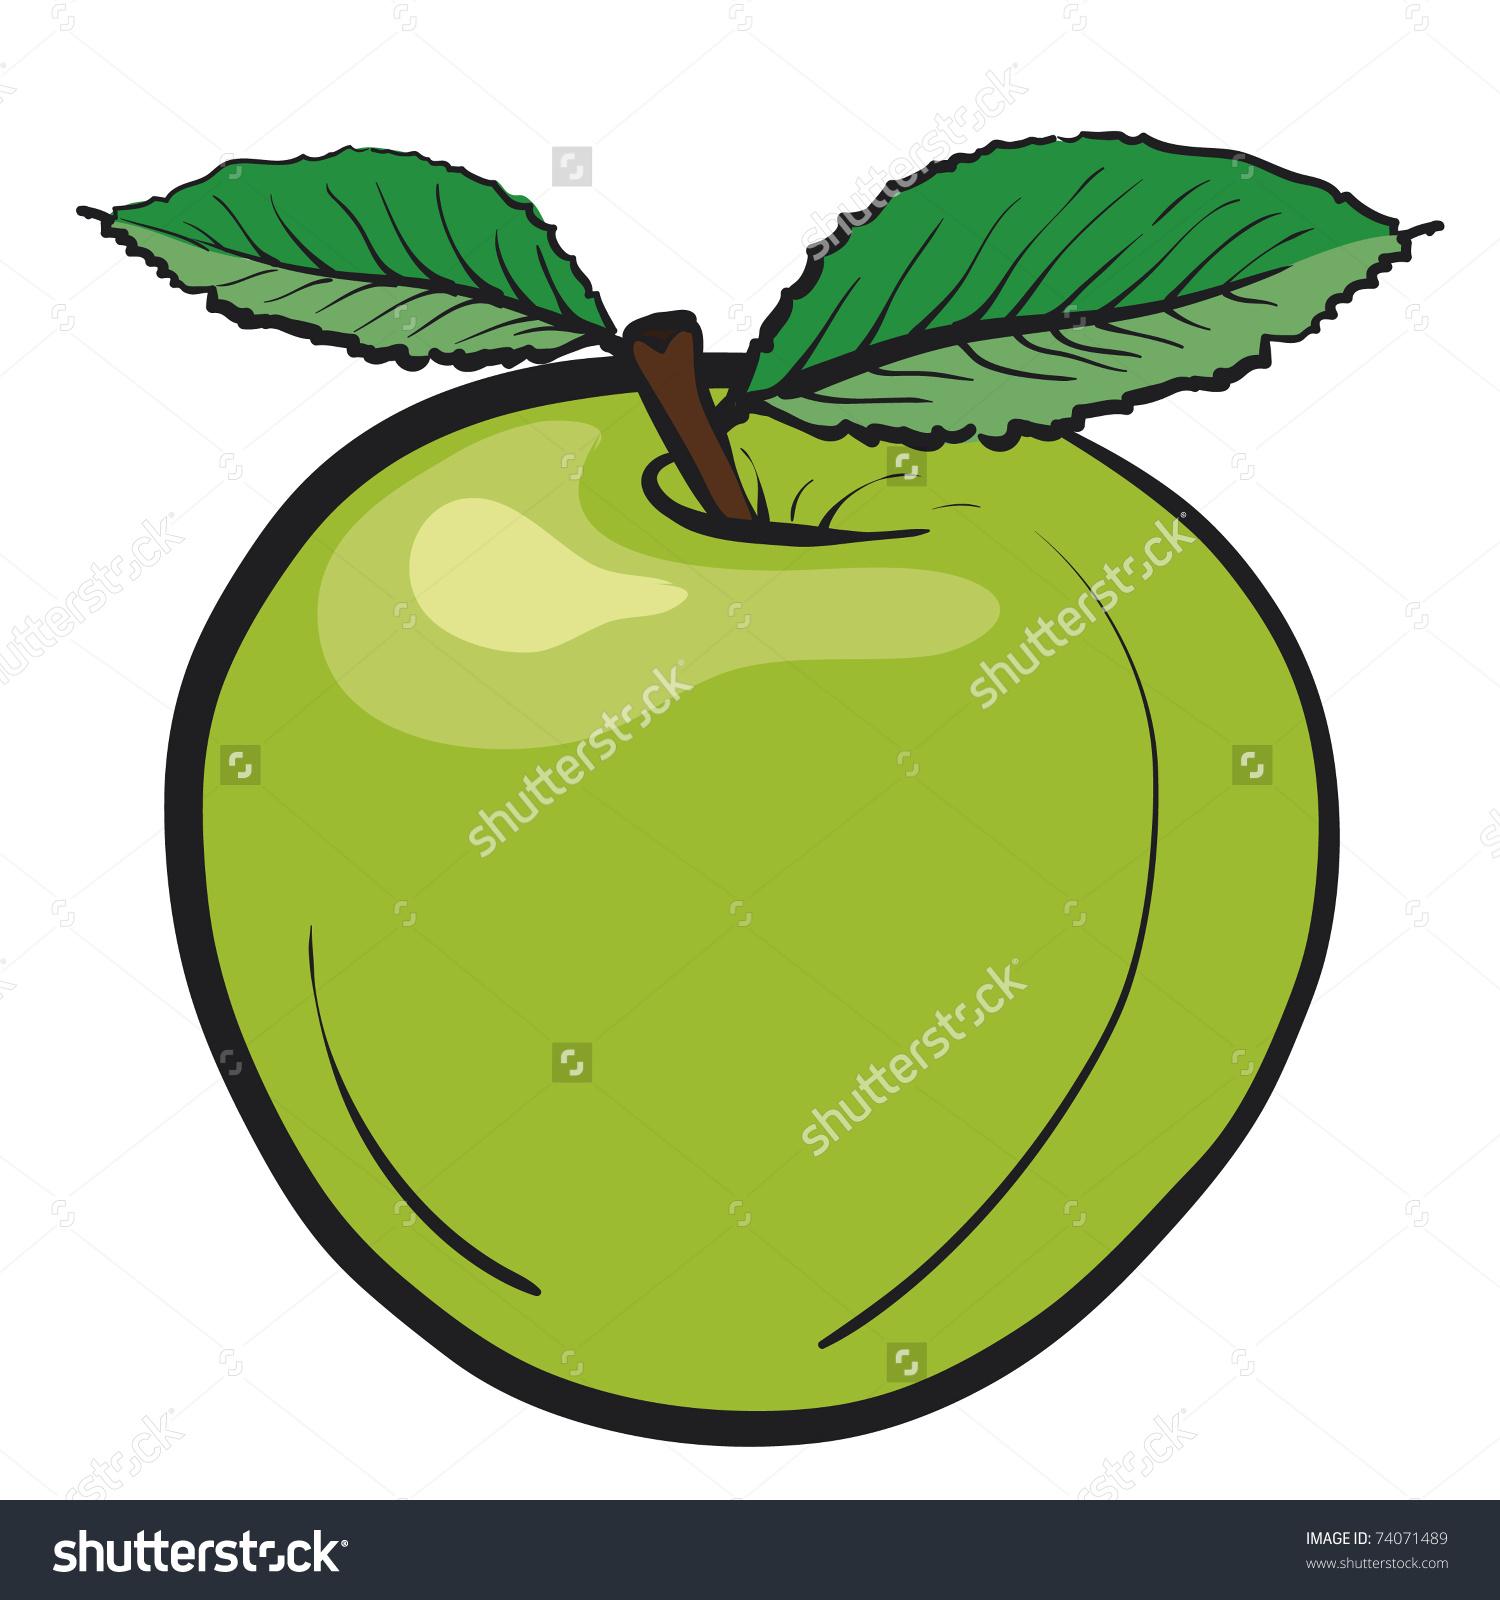 Juicy Green Apple. Fresh Fruit With Green Leaves. Healthy Food.